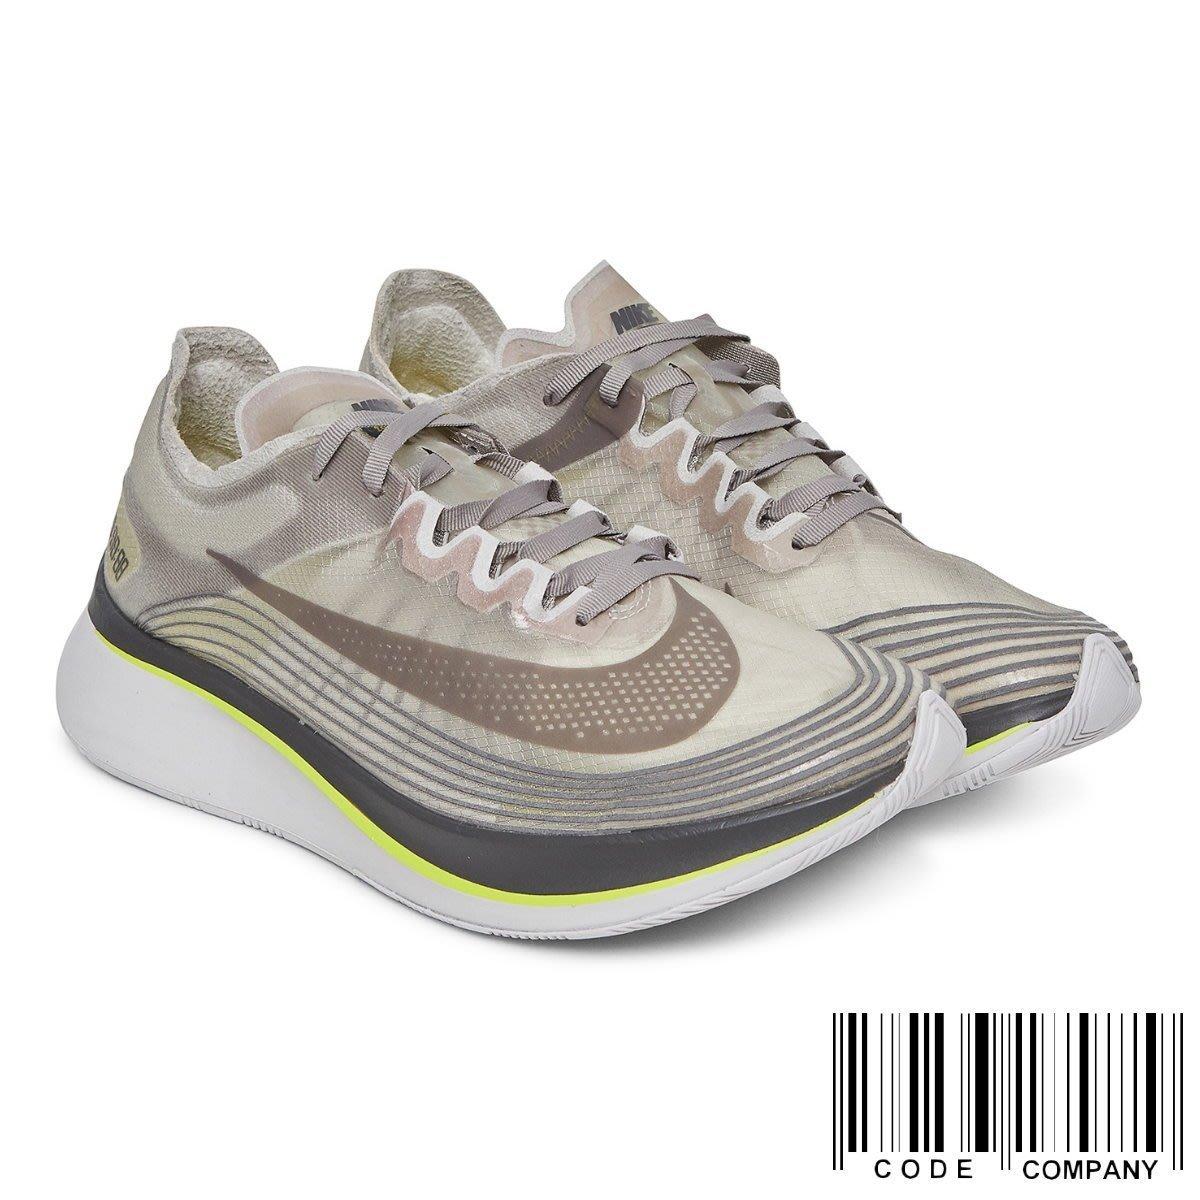 =CodE= NIKE ZOOM FLY SP SEPIA 3M反光飛線慢跑鞋(卡其黃) AA3172-201 男 預購